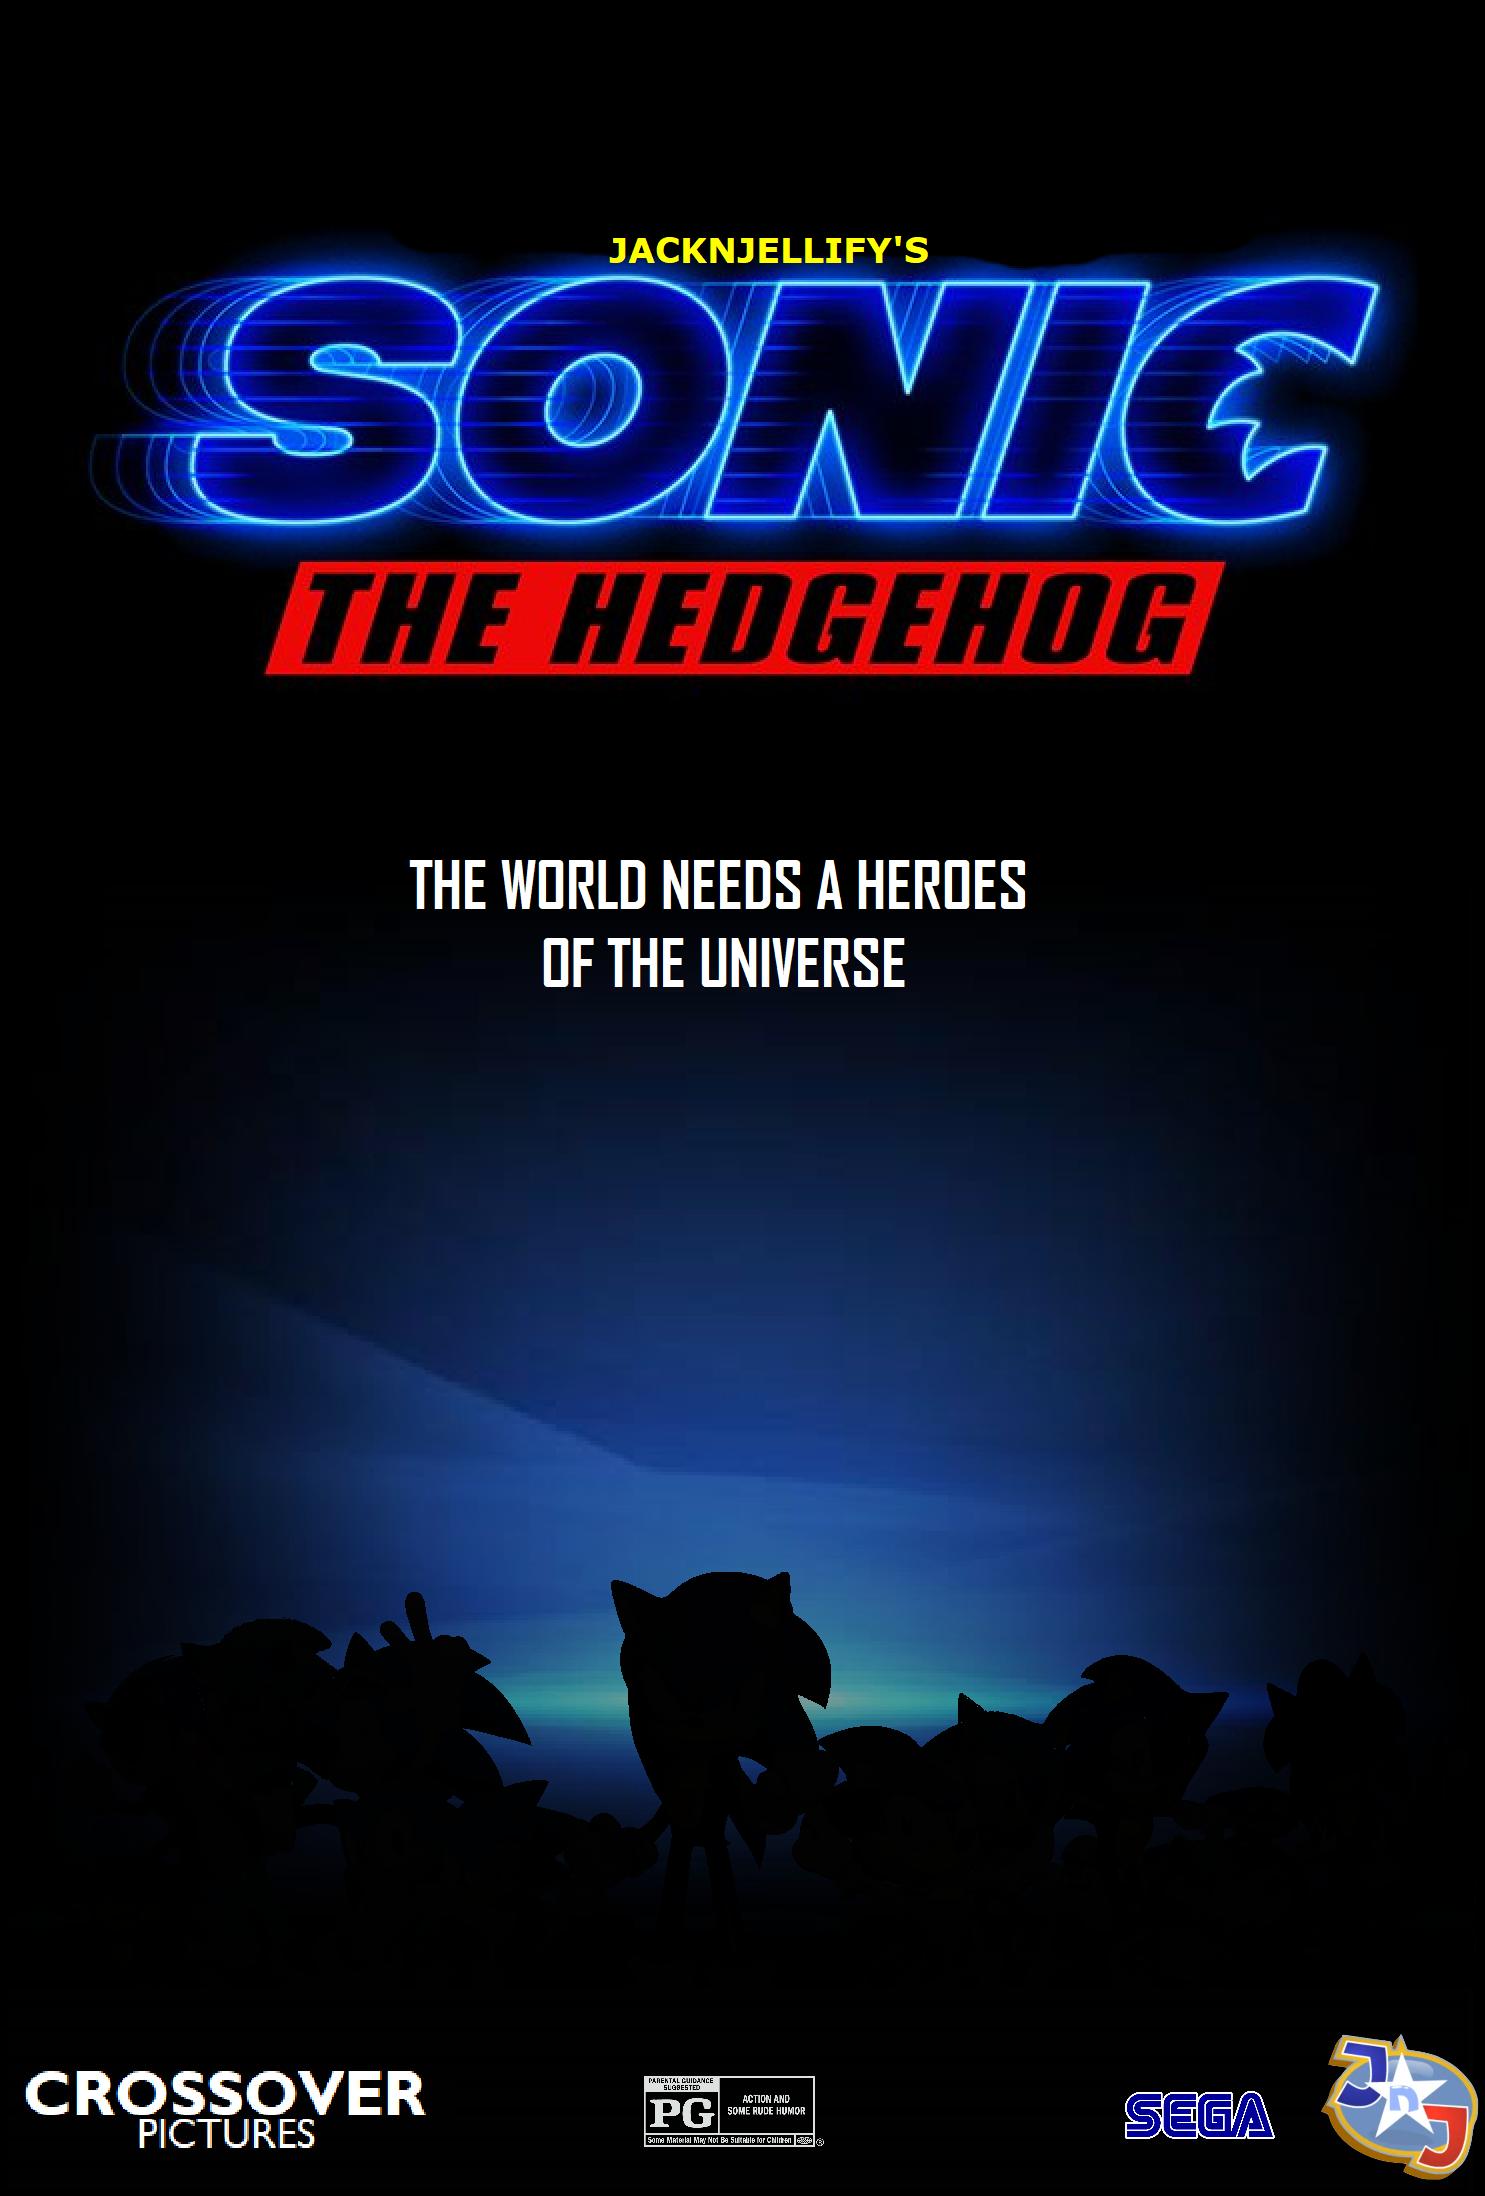 Jacknjellify's Sonic The Hedgehog